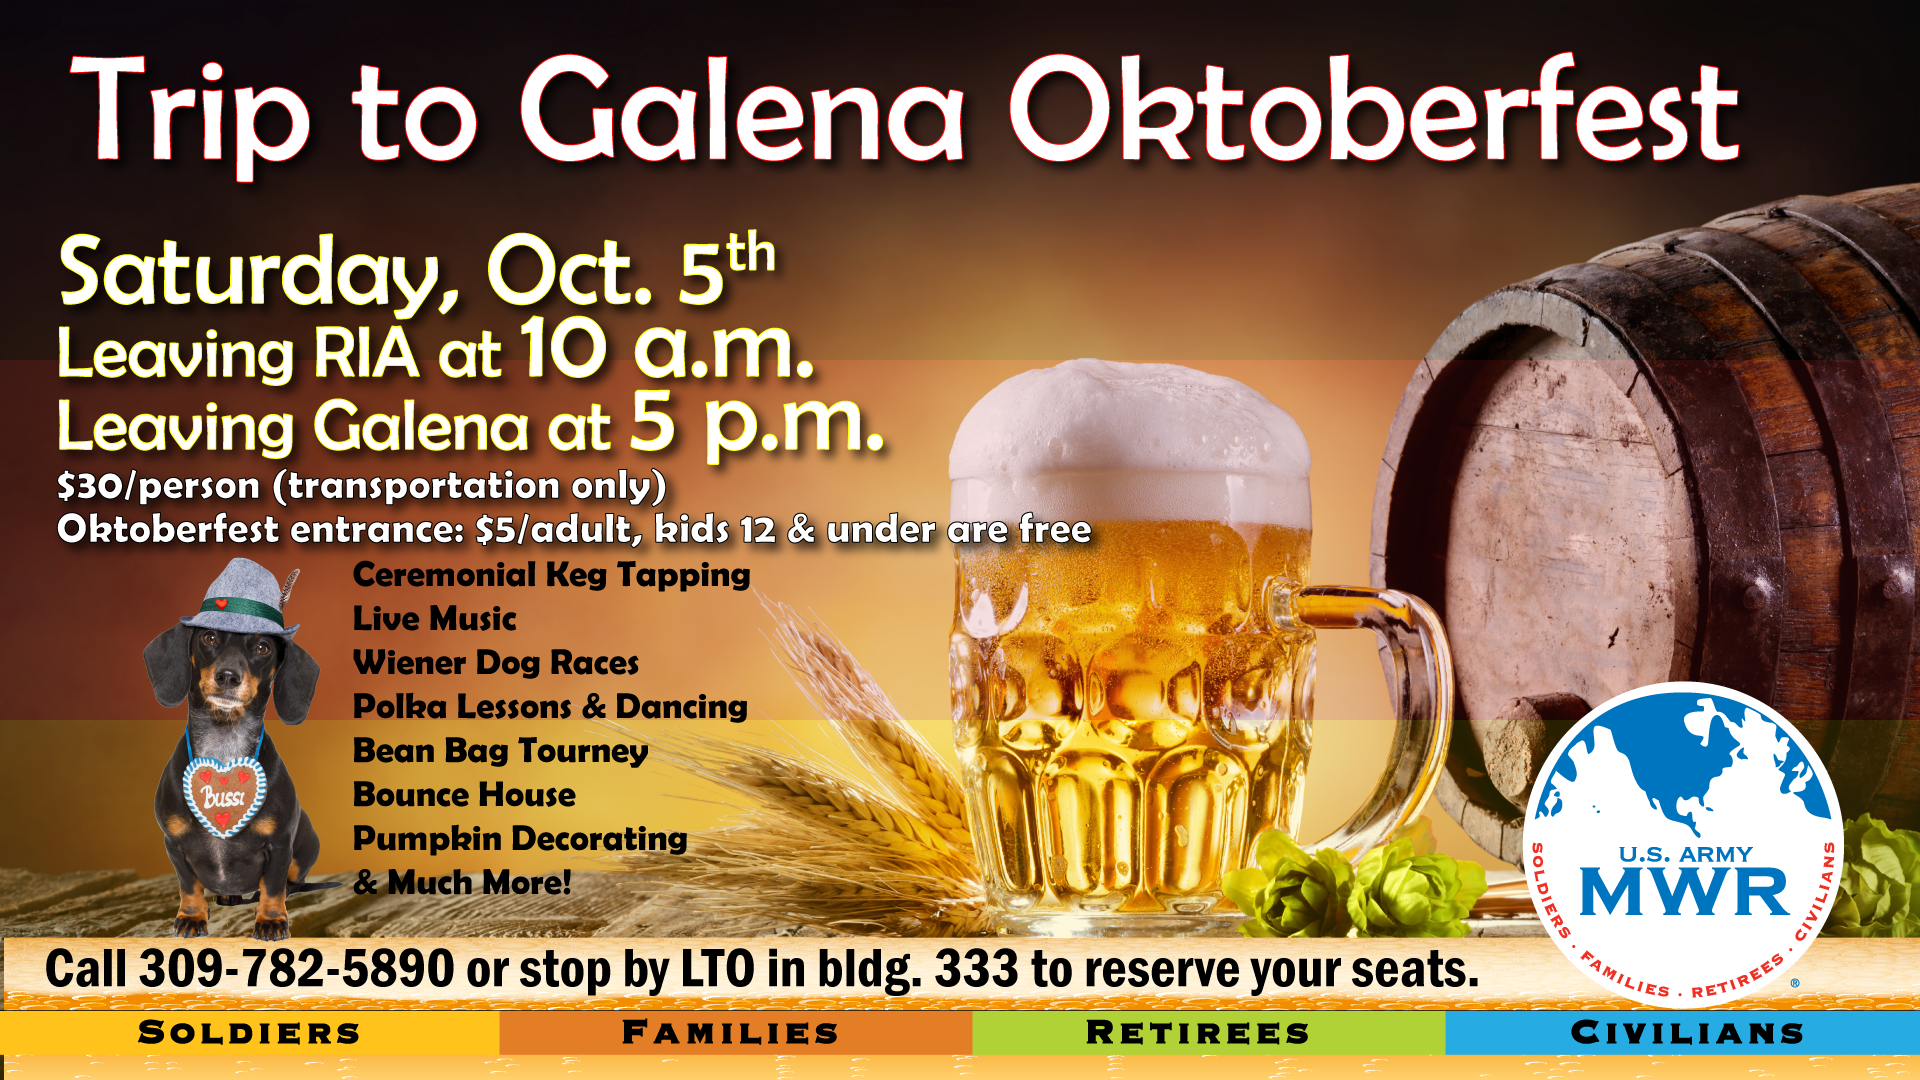 Trip to Galena Oktoberfest